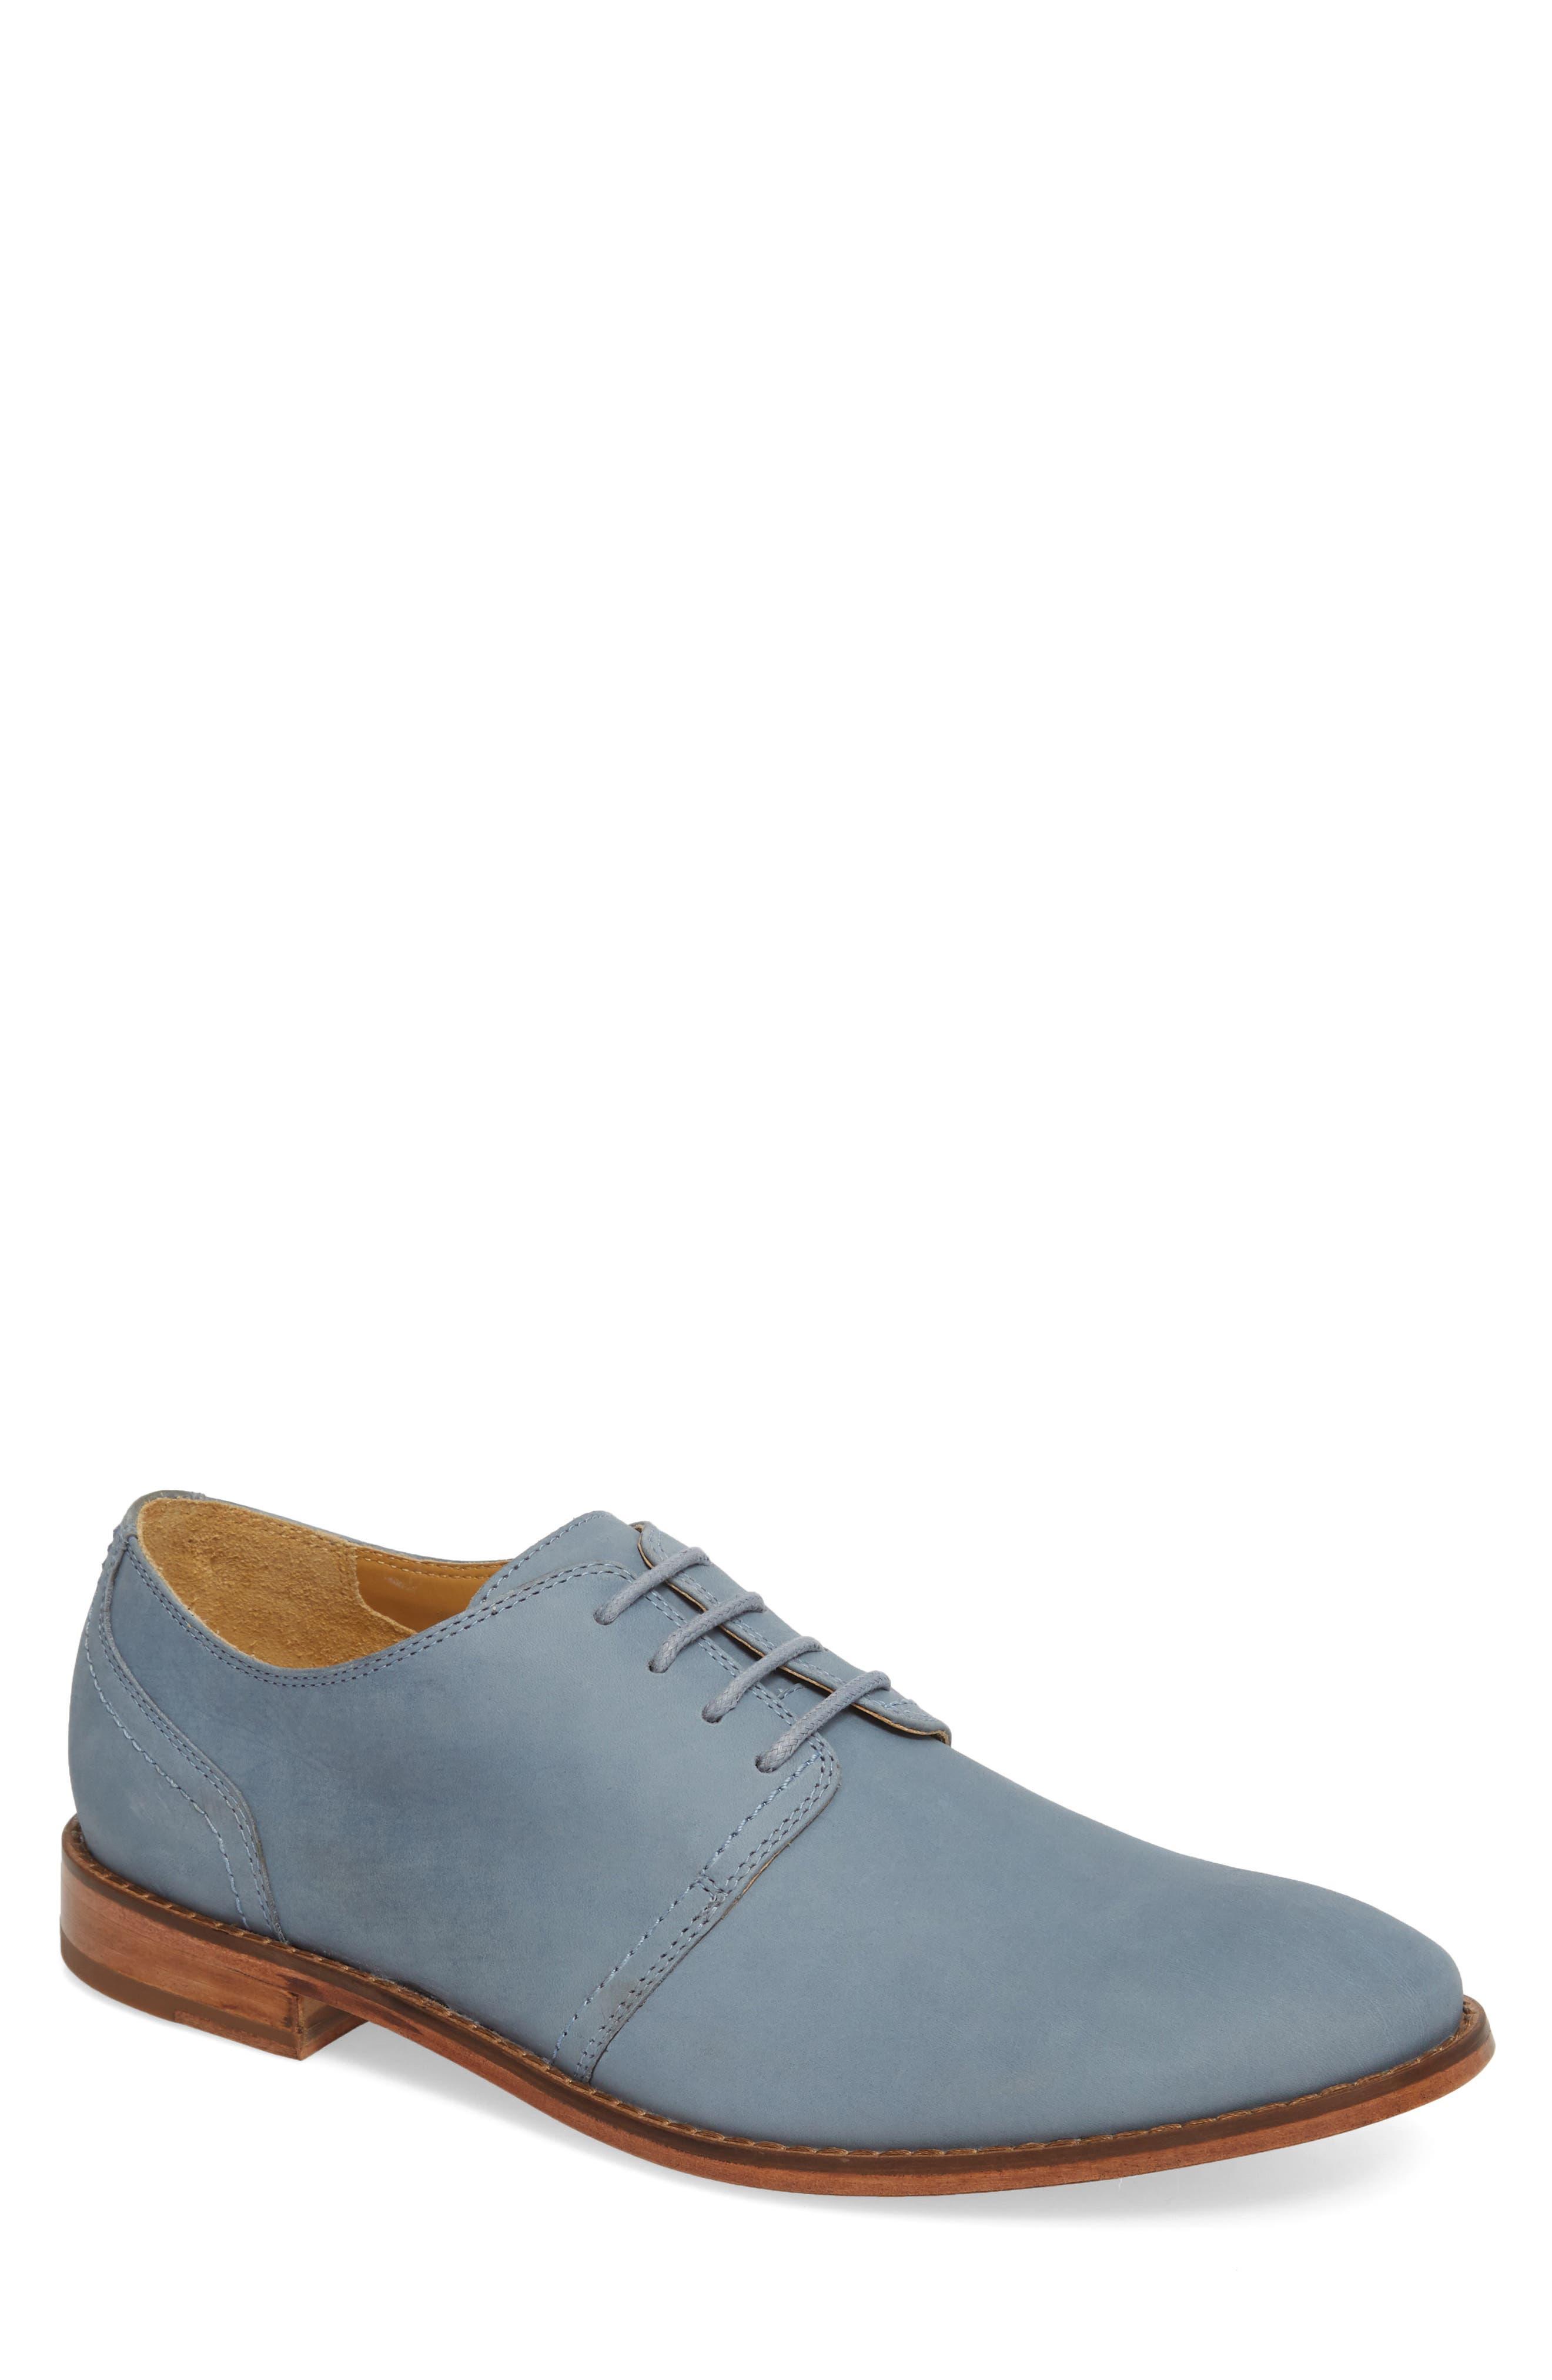 Caan Plain Toe Derby,                             Main thumbnail 1, color,                             Flint Stone Leather